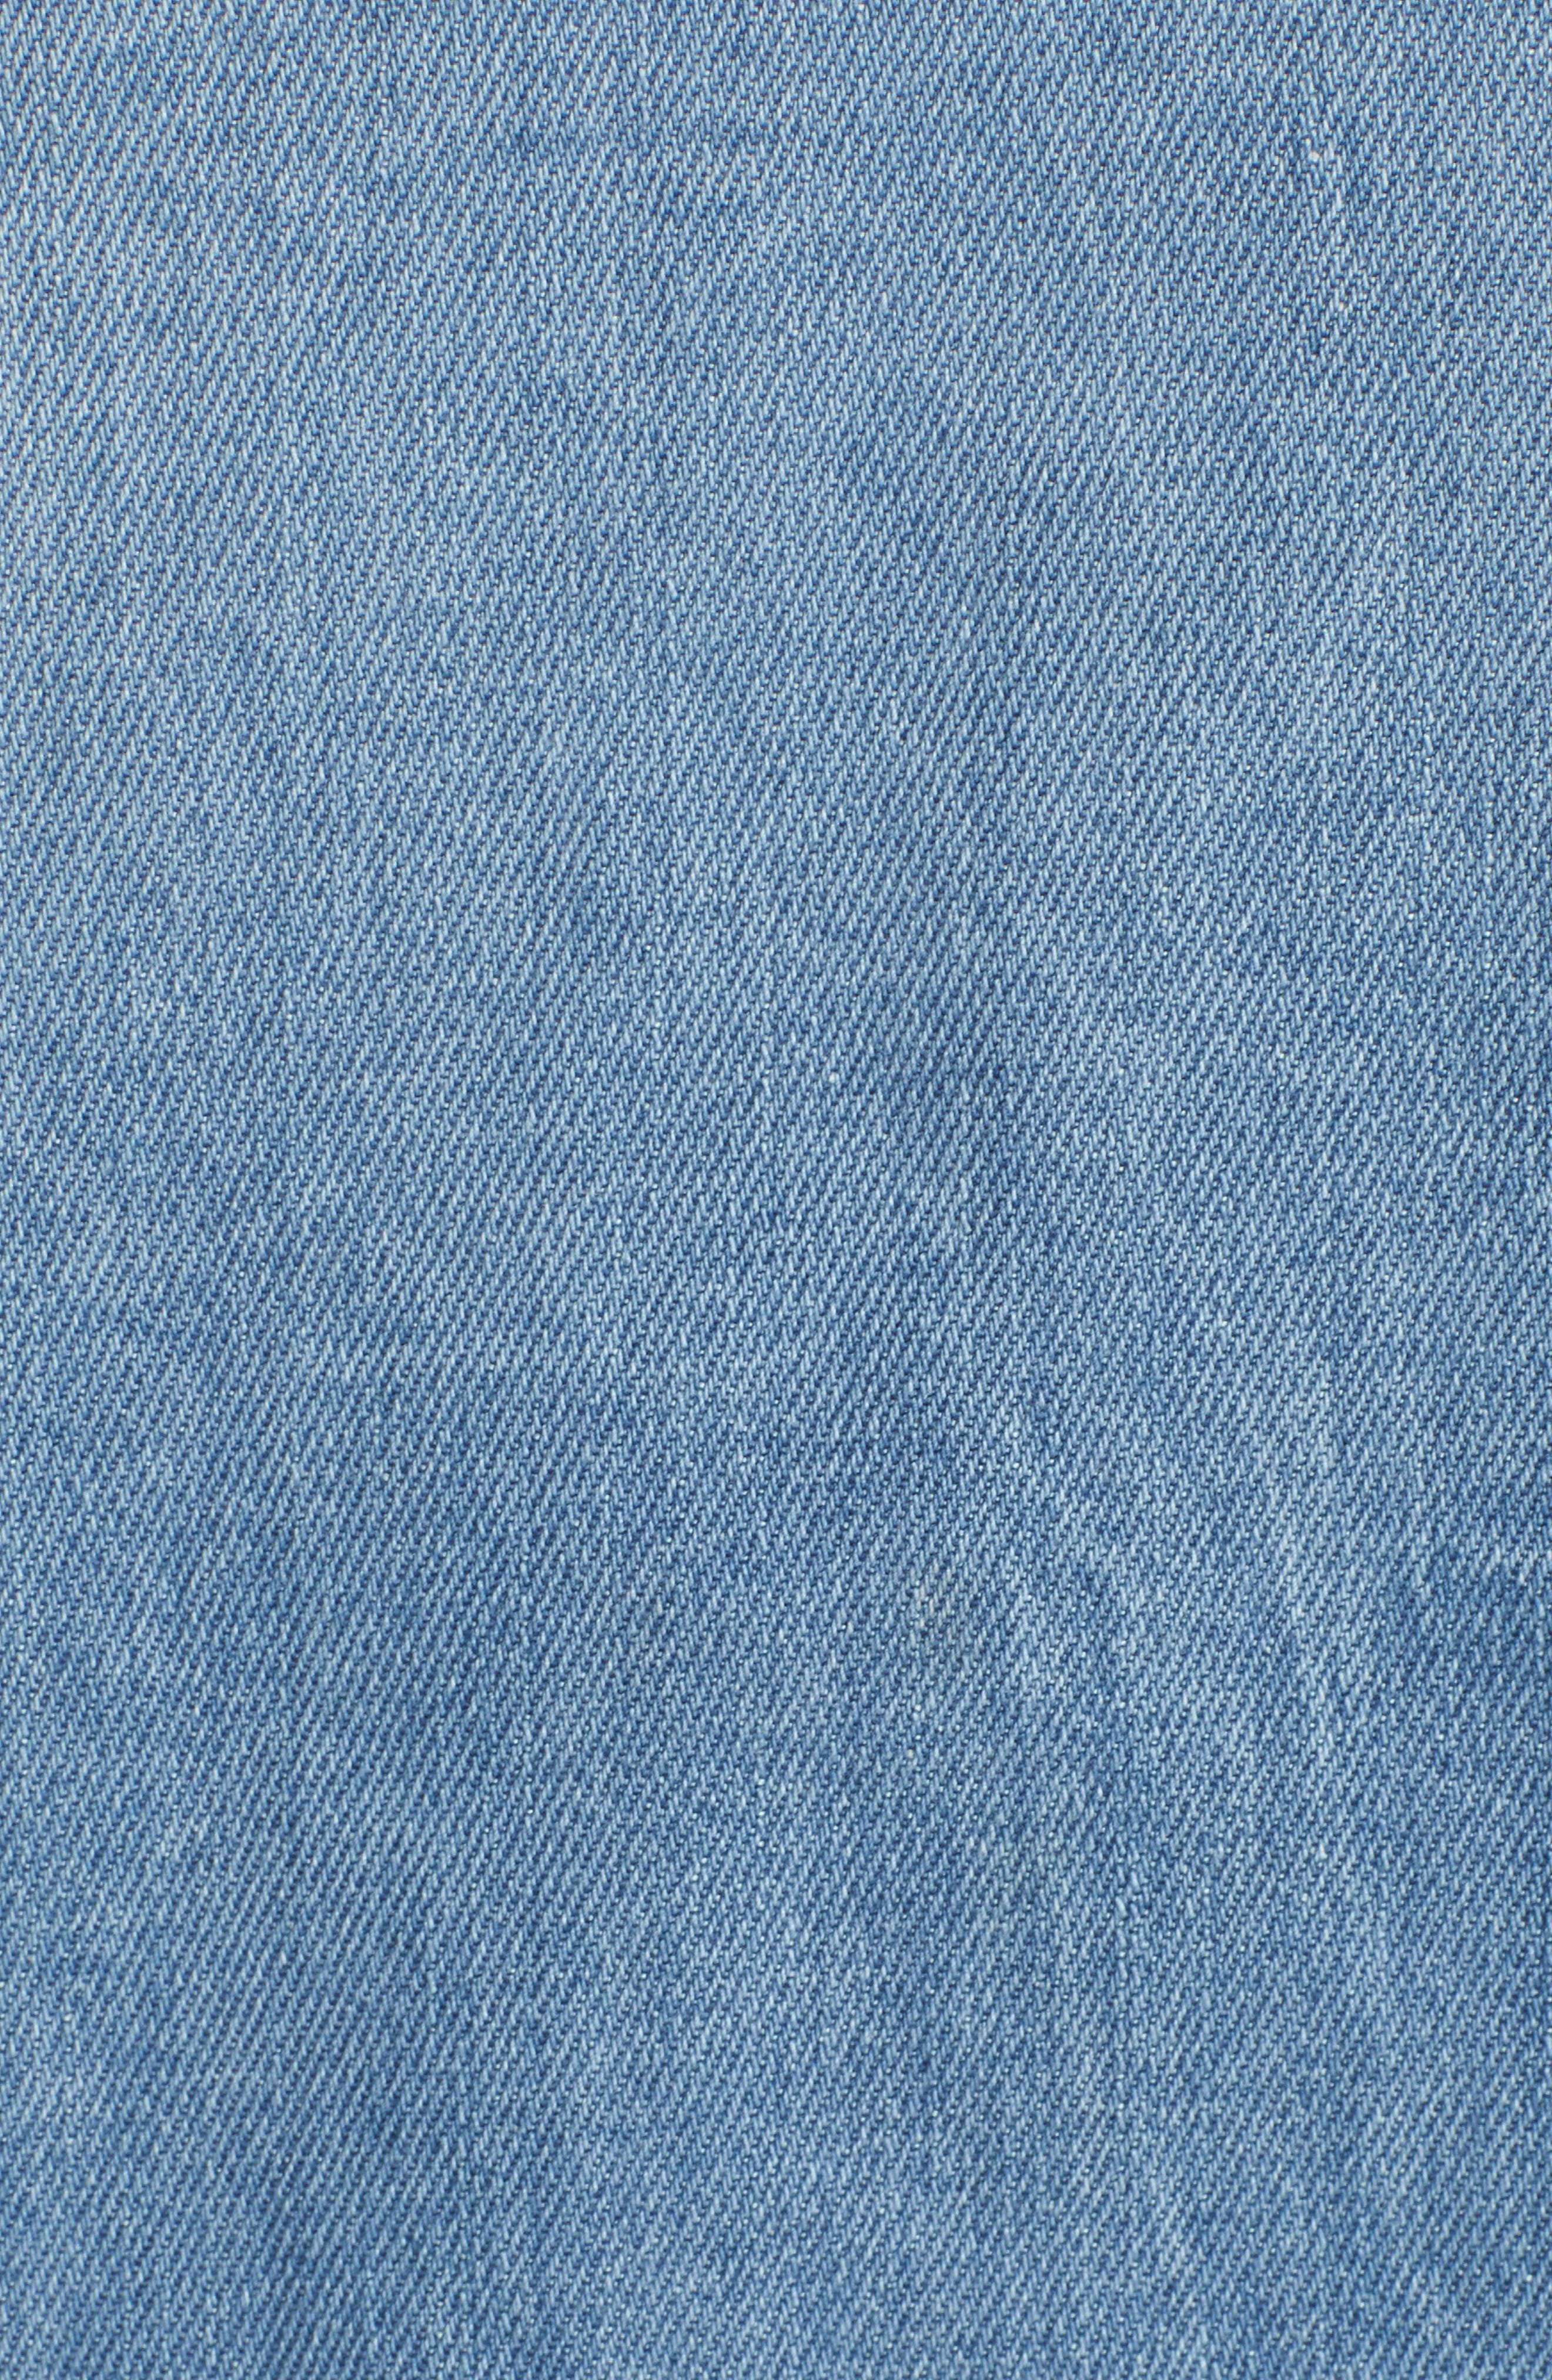 Kick Destroy Deconstructed Denim Jacket,                             Alternate thumbnail 6, color,                             Bleu